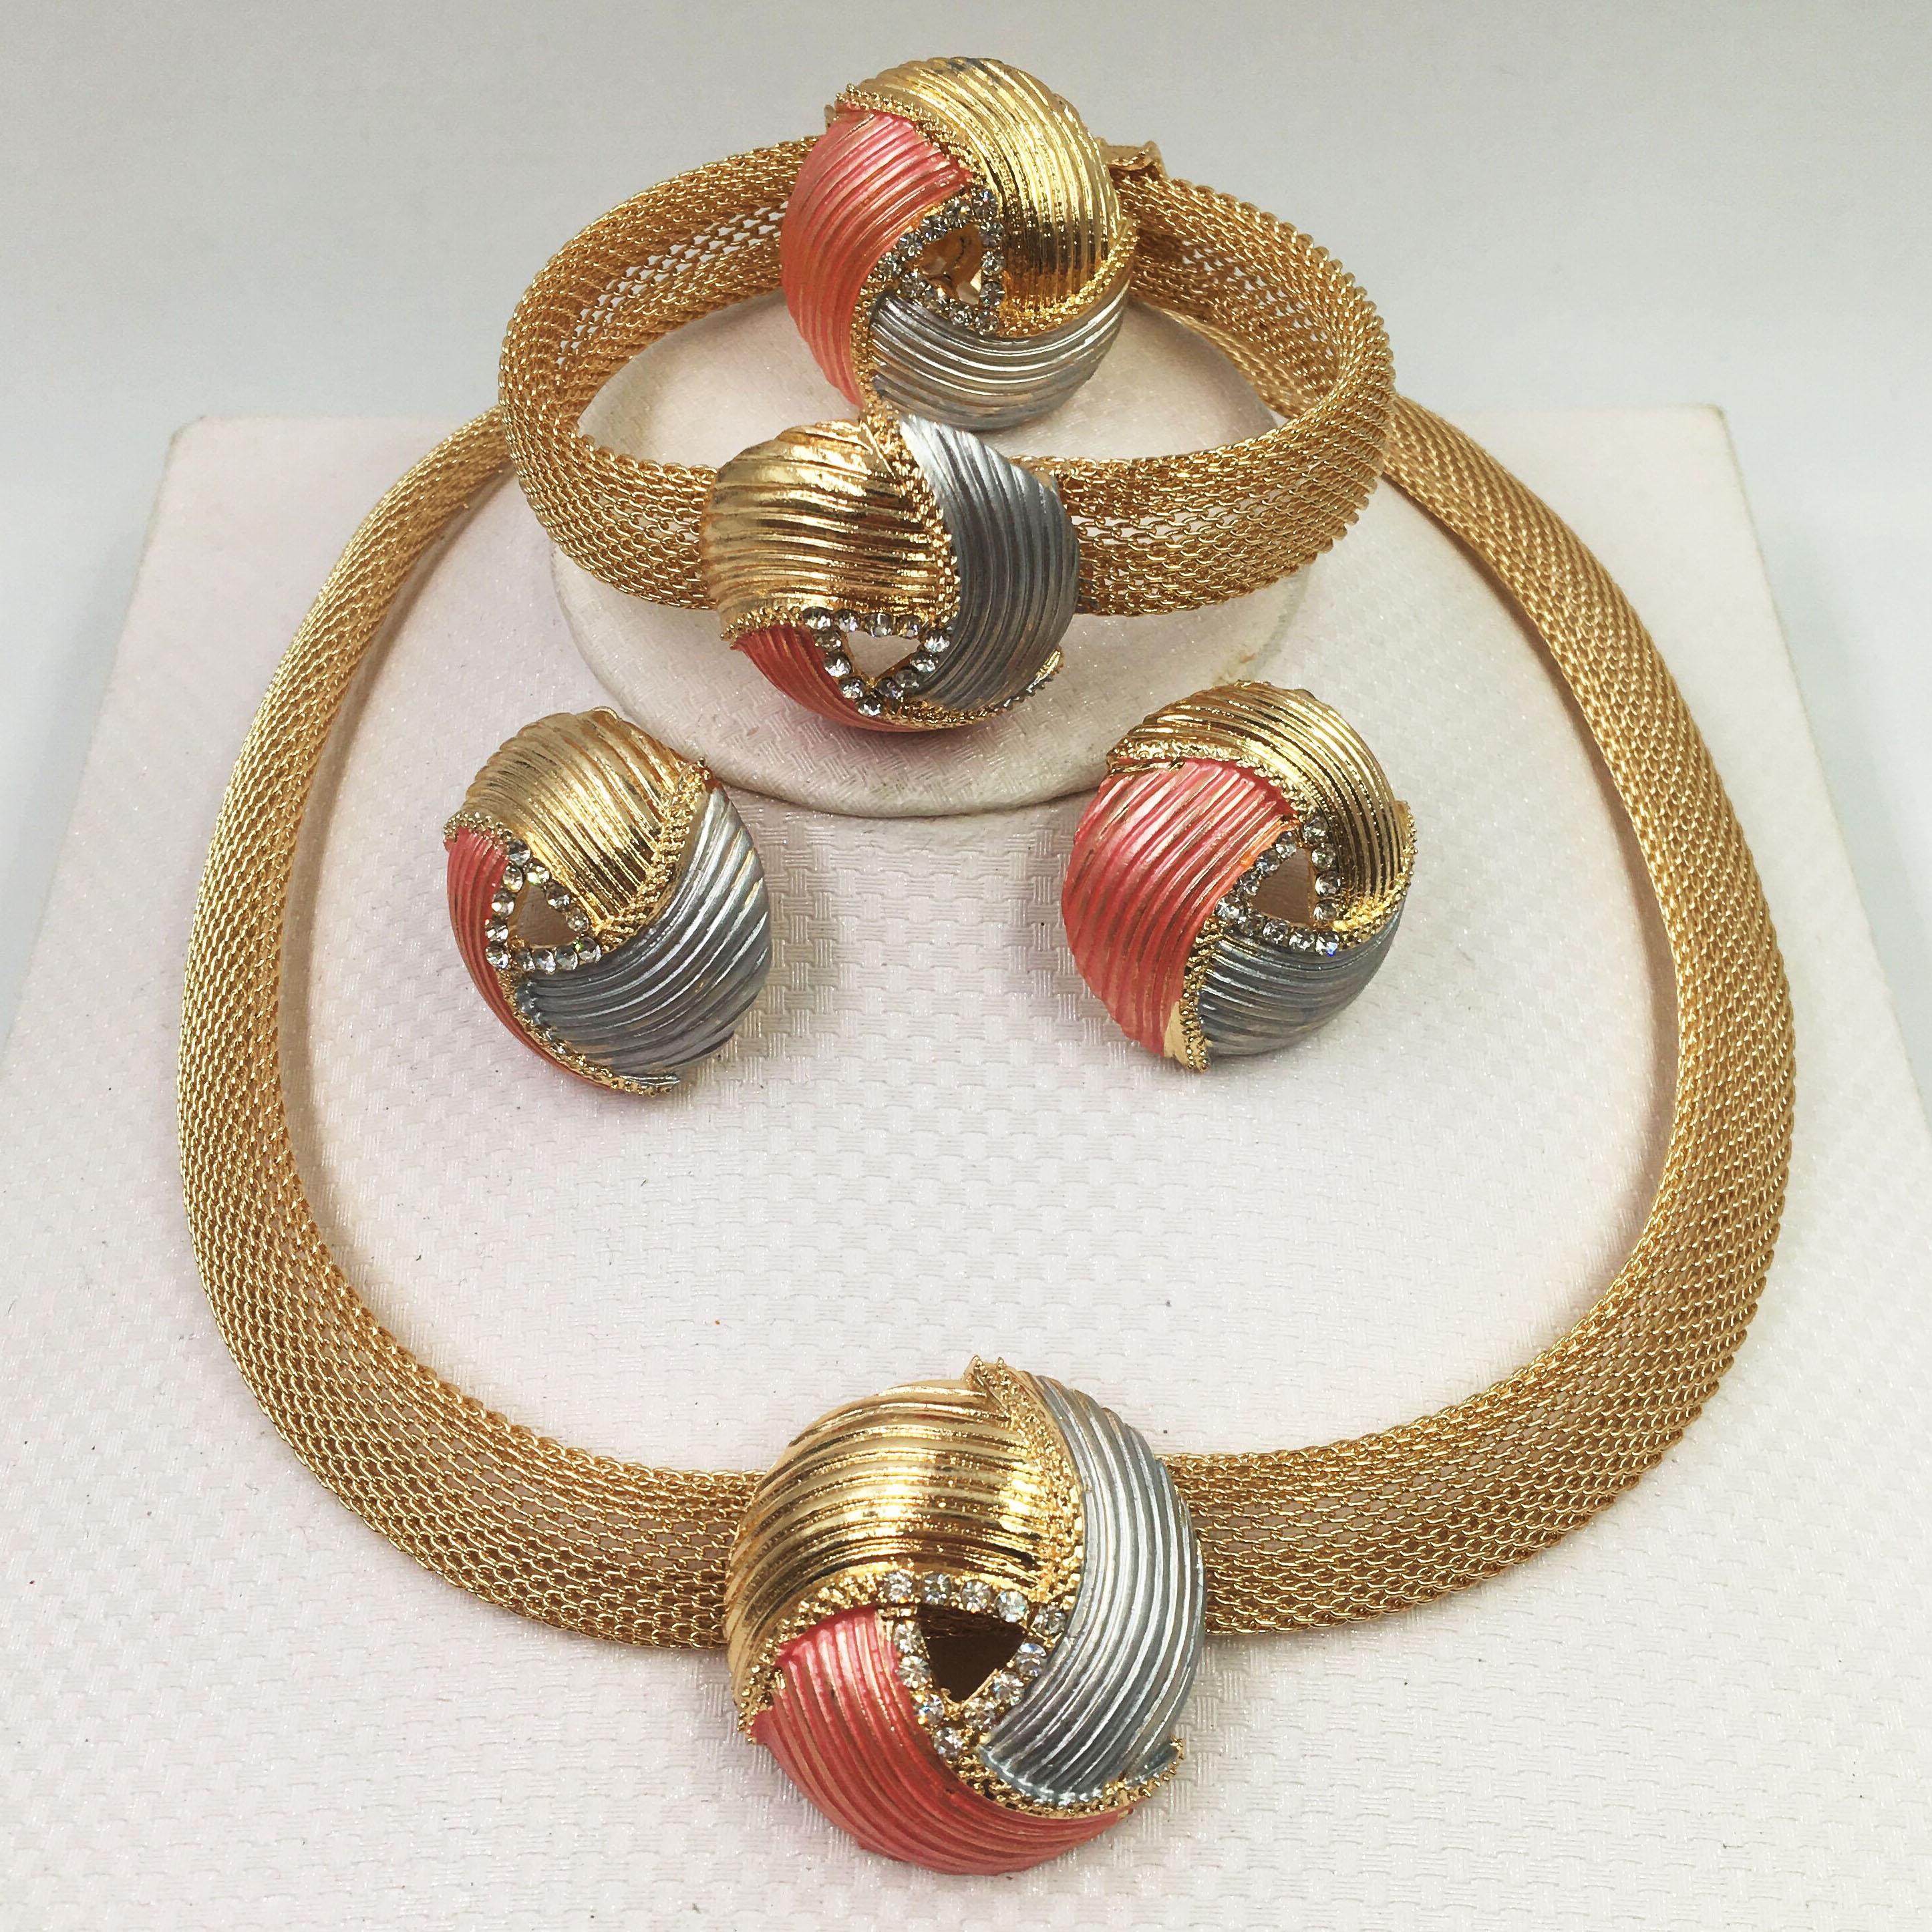 2019 Bridal Gift Nigerian Wedding African Beads Jewelry Set Brand Woman Fashion Dubai Gold Color Jewelry Set Wholesale Design